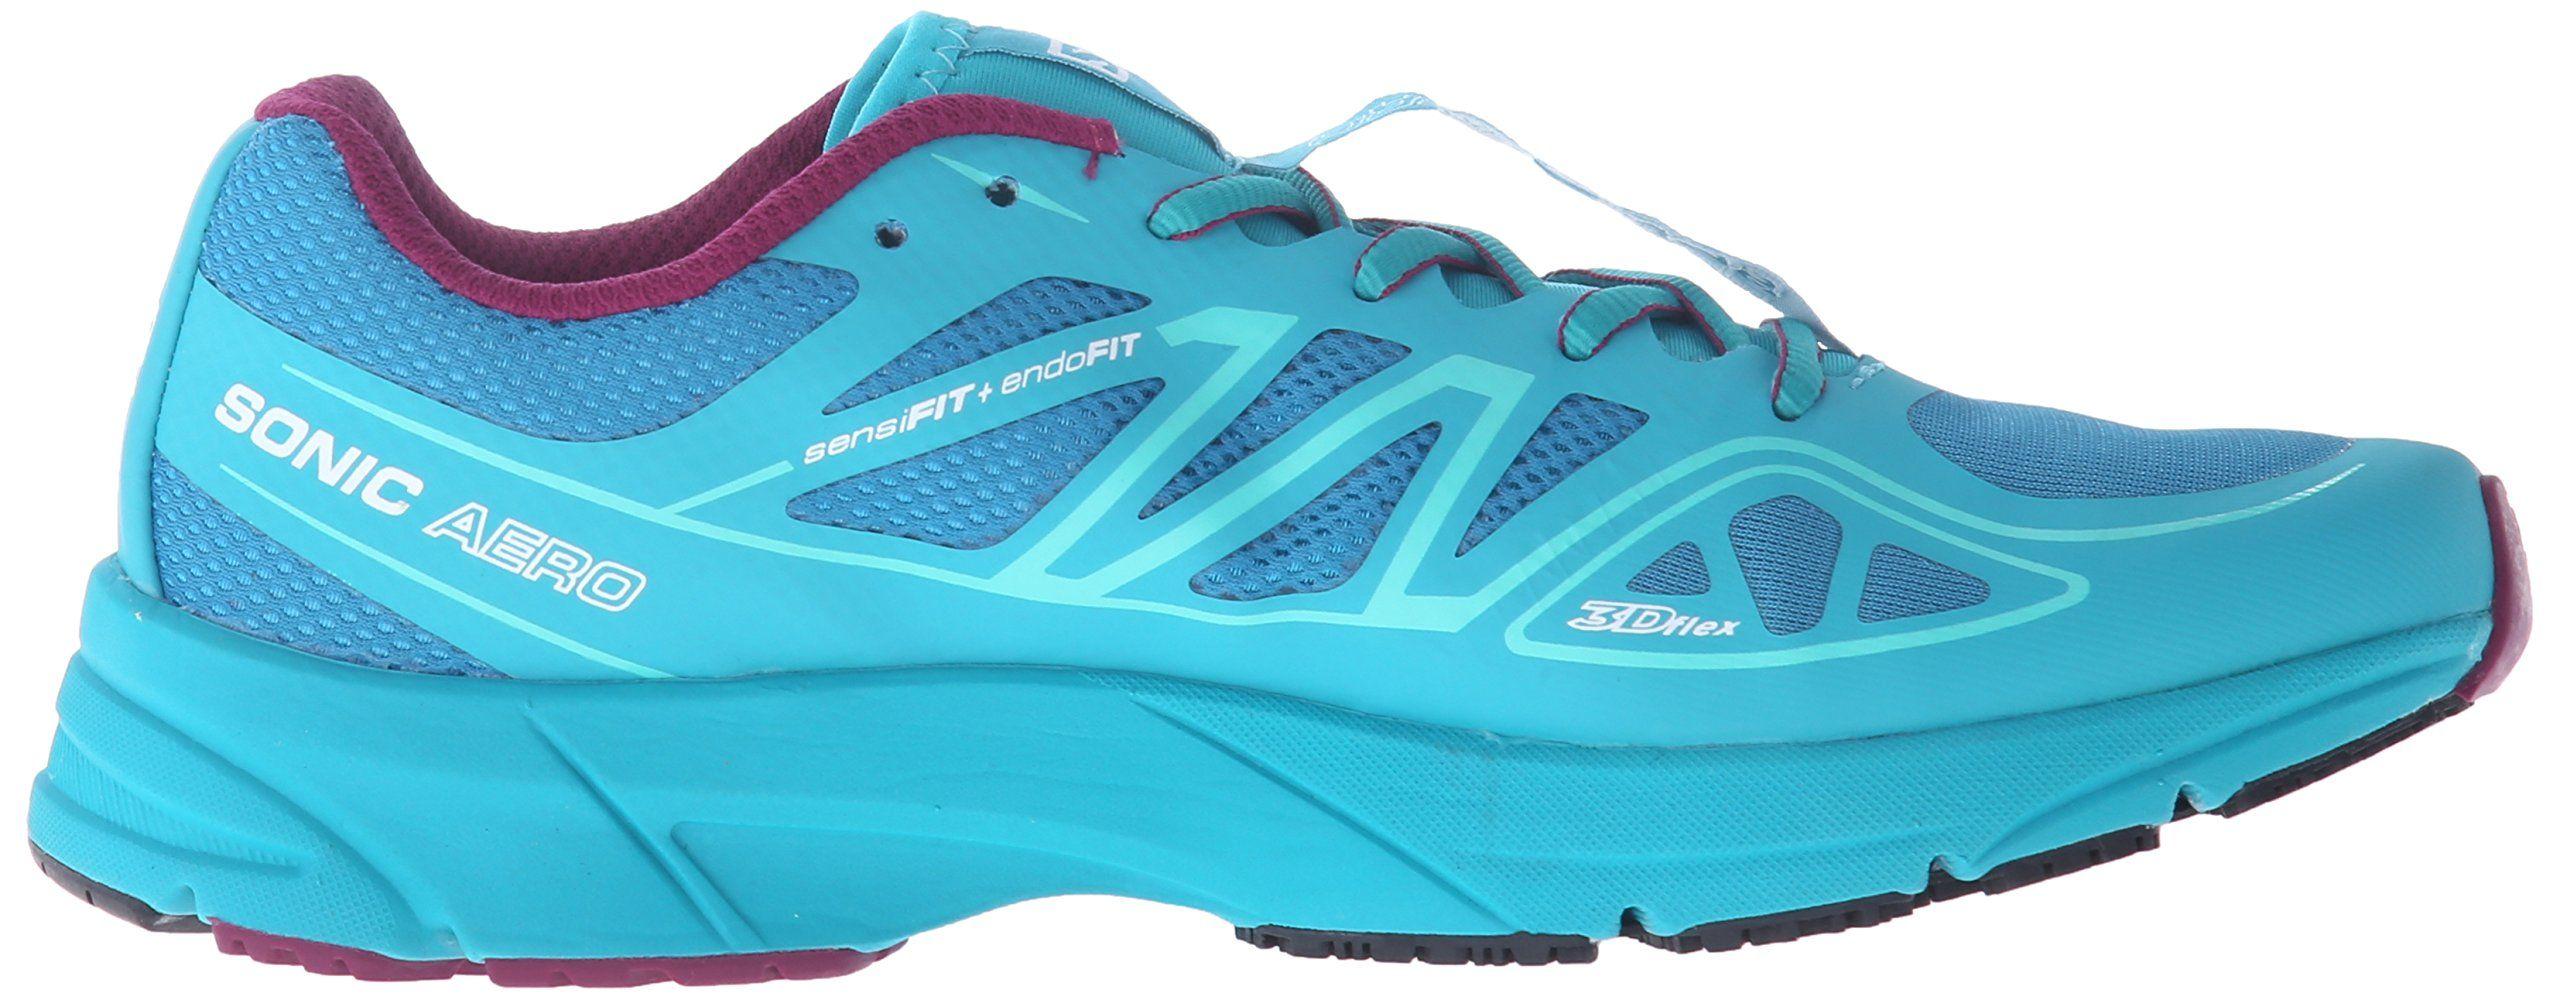 3470b1719cff Salomon Womens Sonic Aero W Running Shoe Fog Blue Teal Blue F Mystic Purple